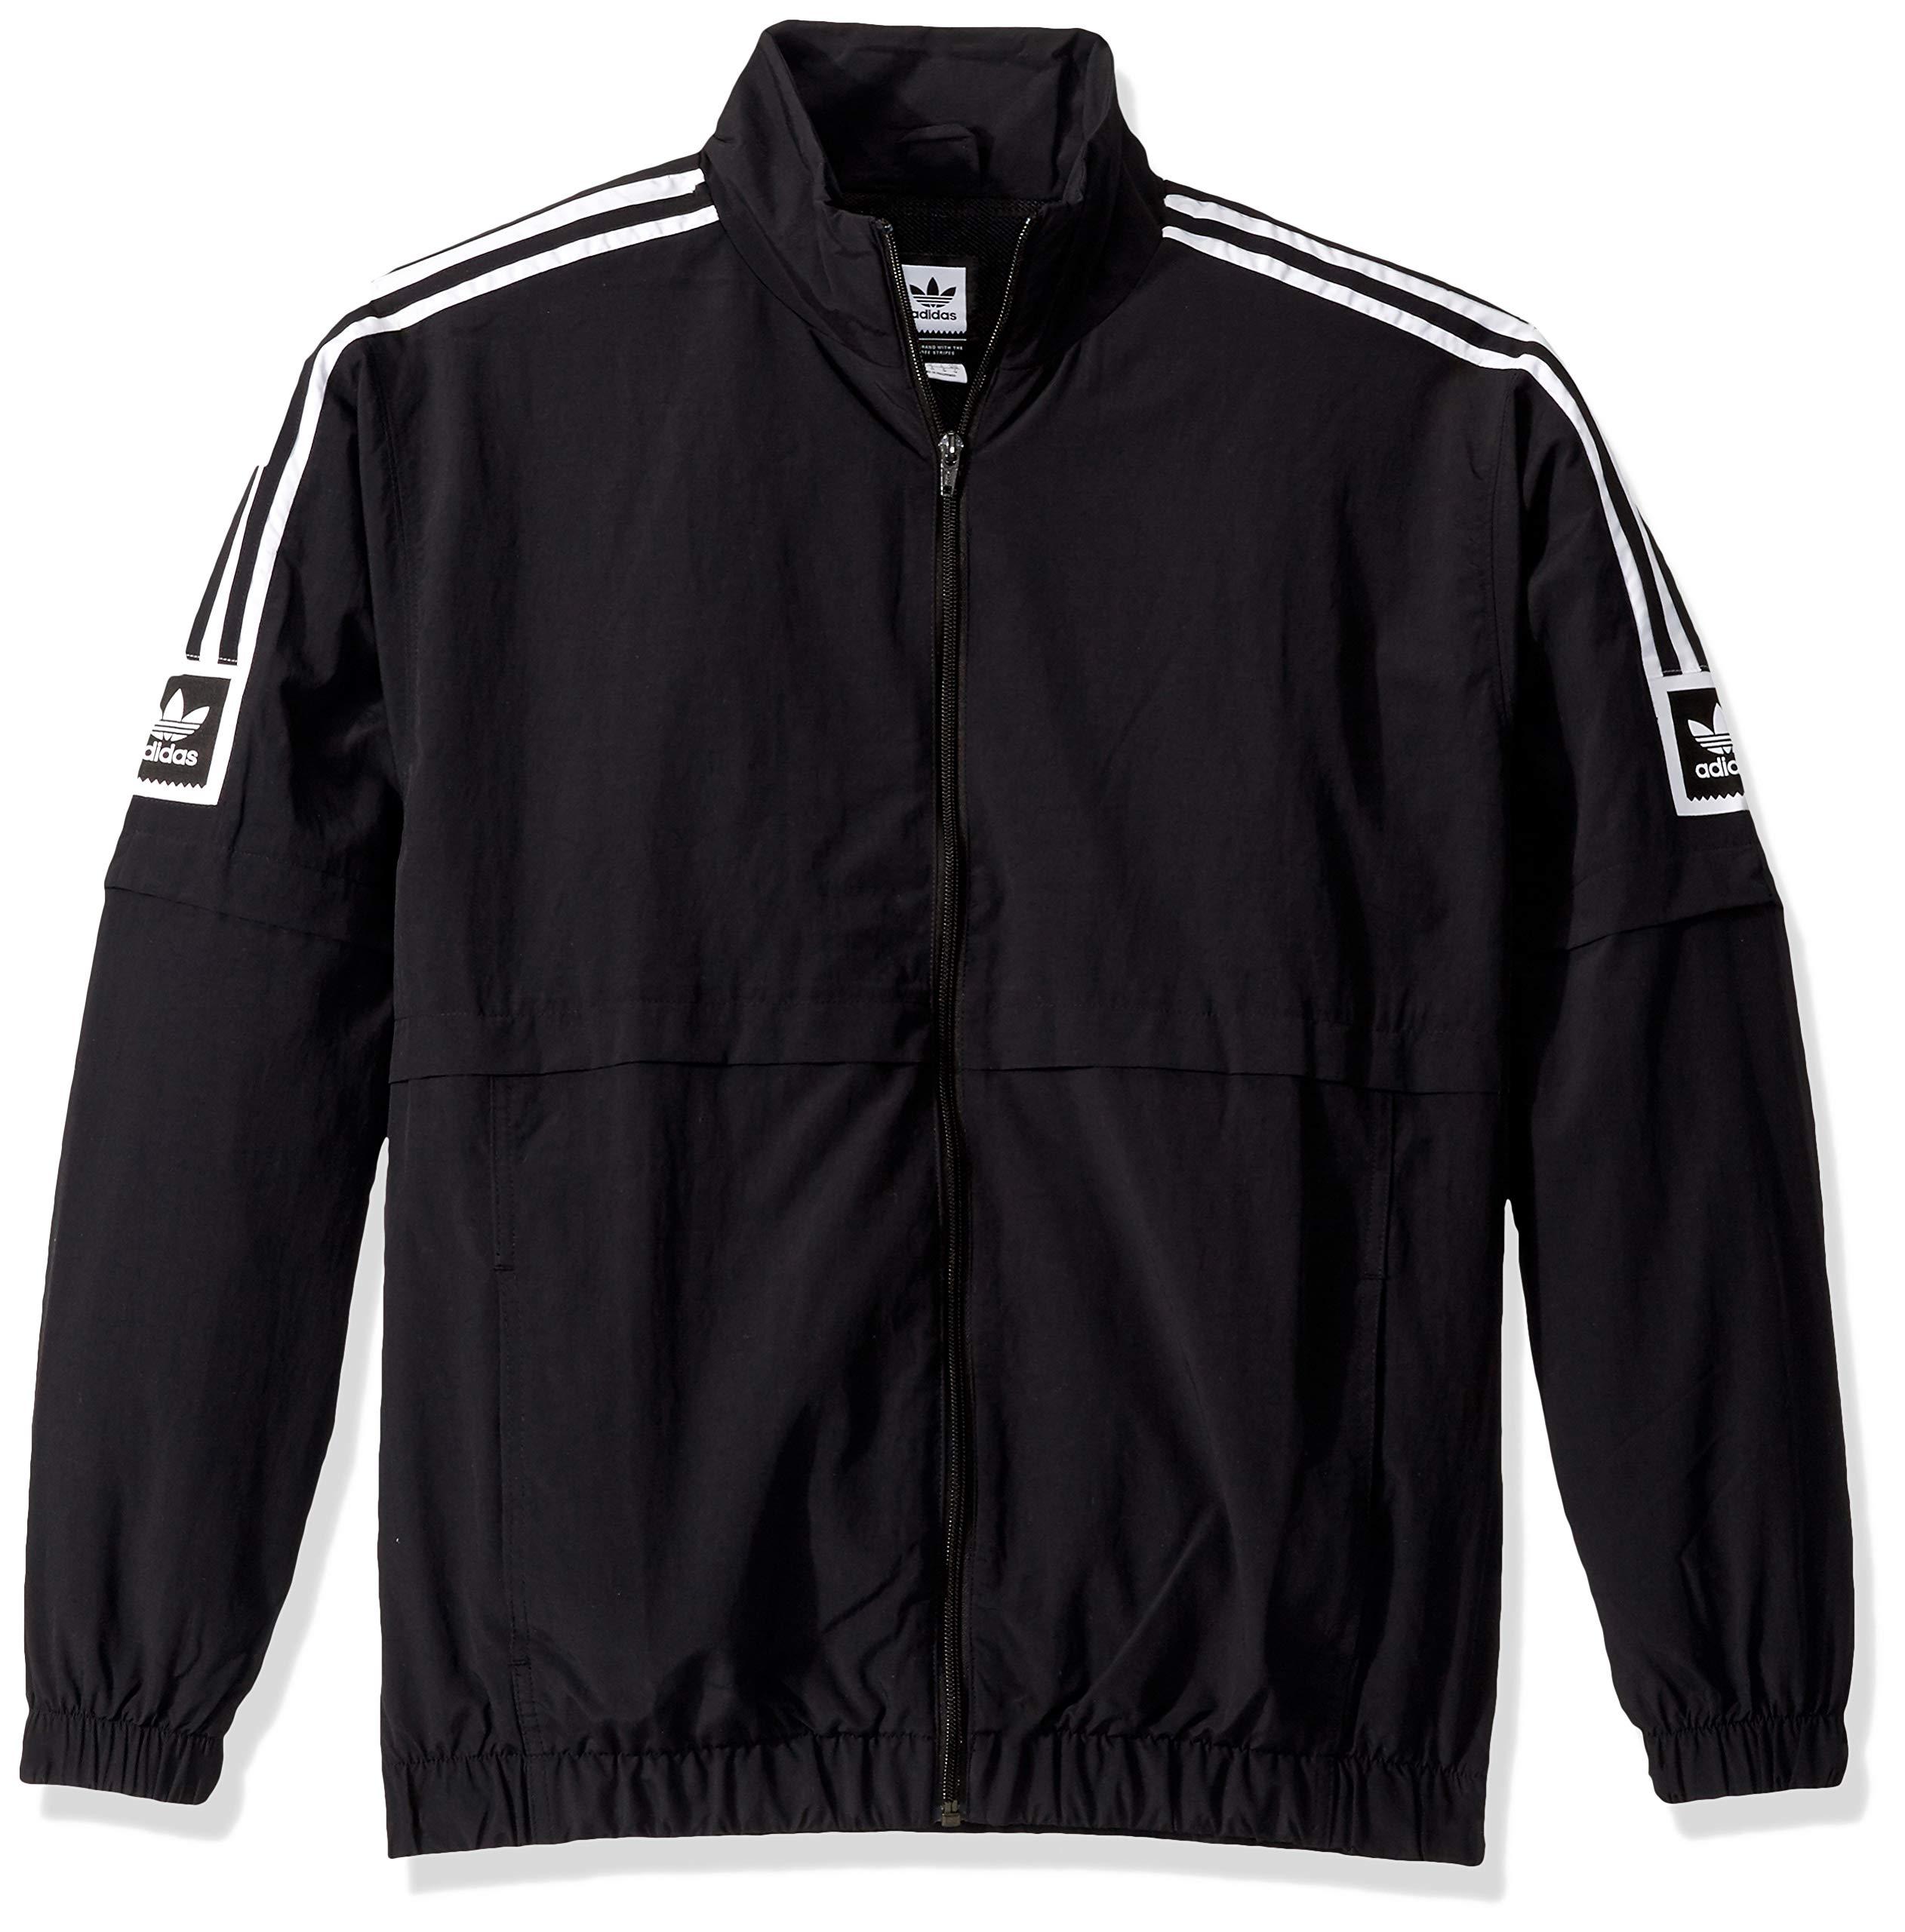 adidas Originals Men's Skate Stdrd 20 Jacket, black/White, Small by adidas Originals